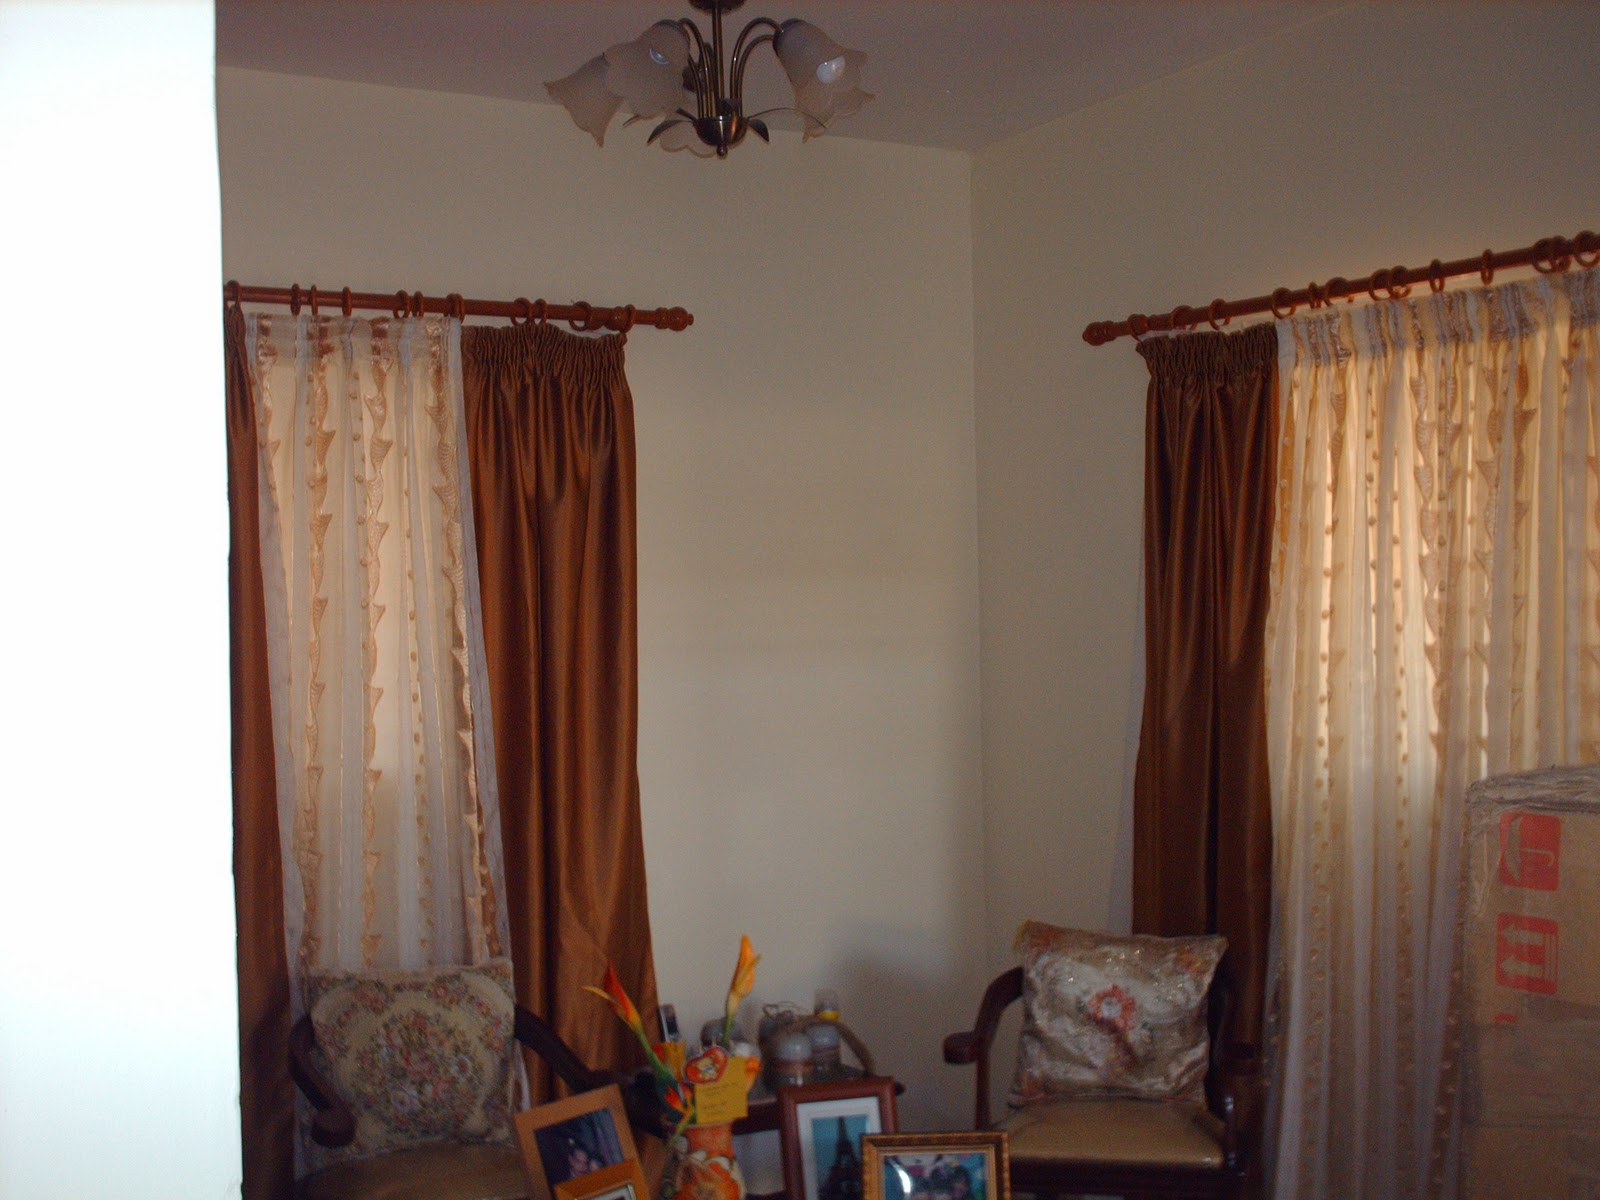 Novedades Paola: Proyecto Cortinas para mi casa